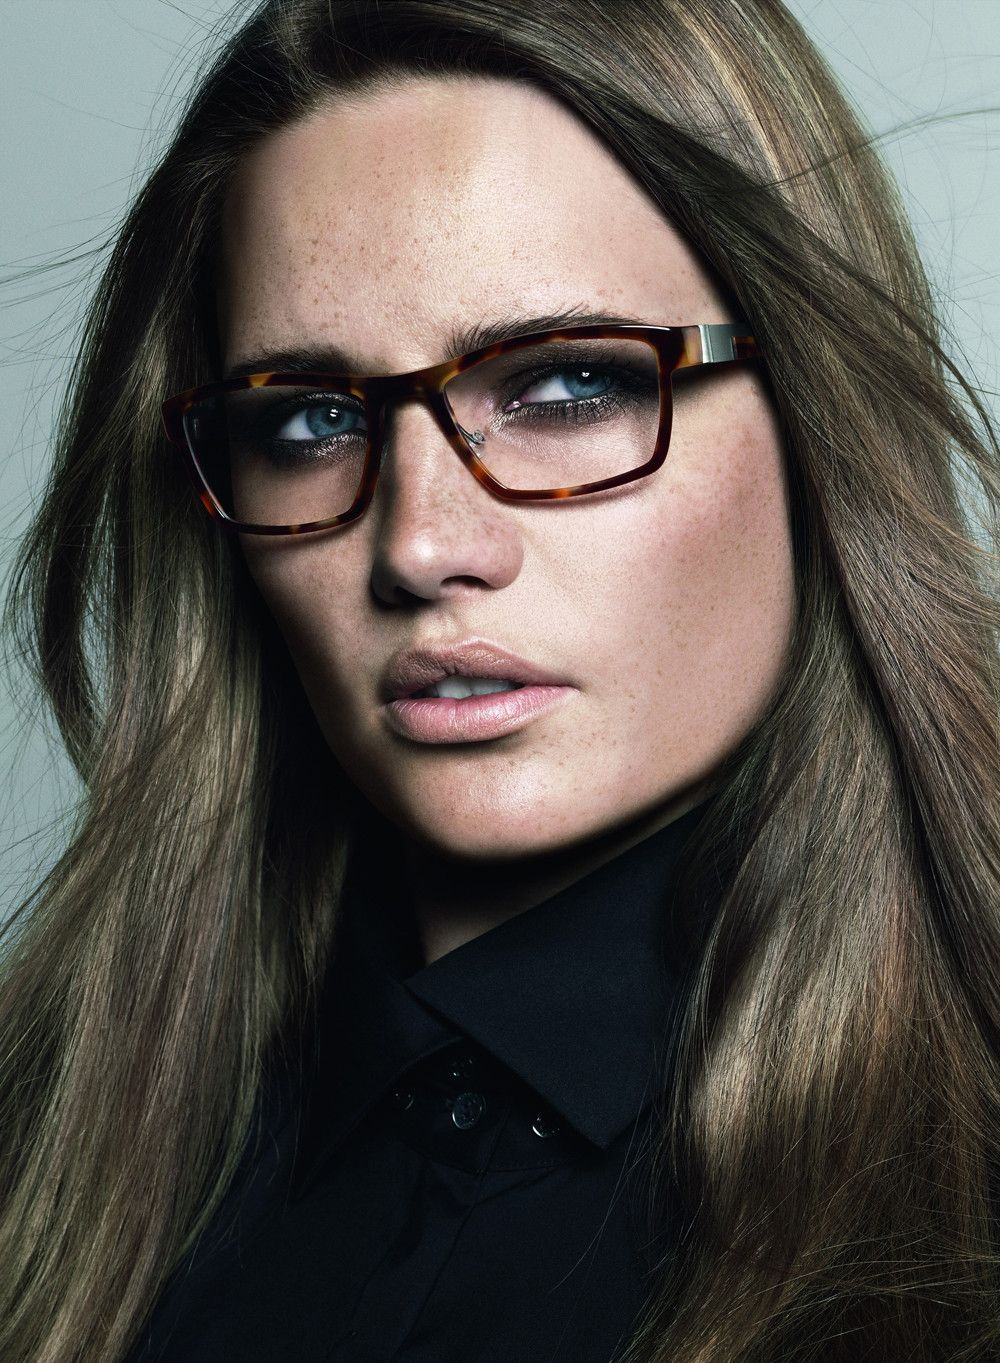 LINDBERG Acetanium 1020 | Girls with Glasses | Pinterest | Brille